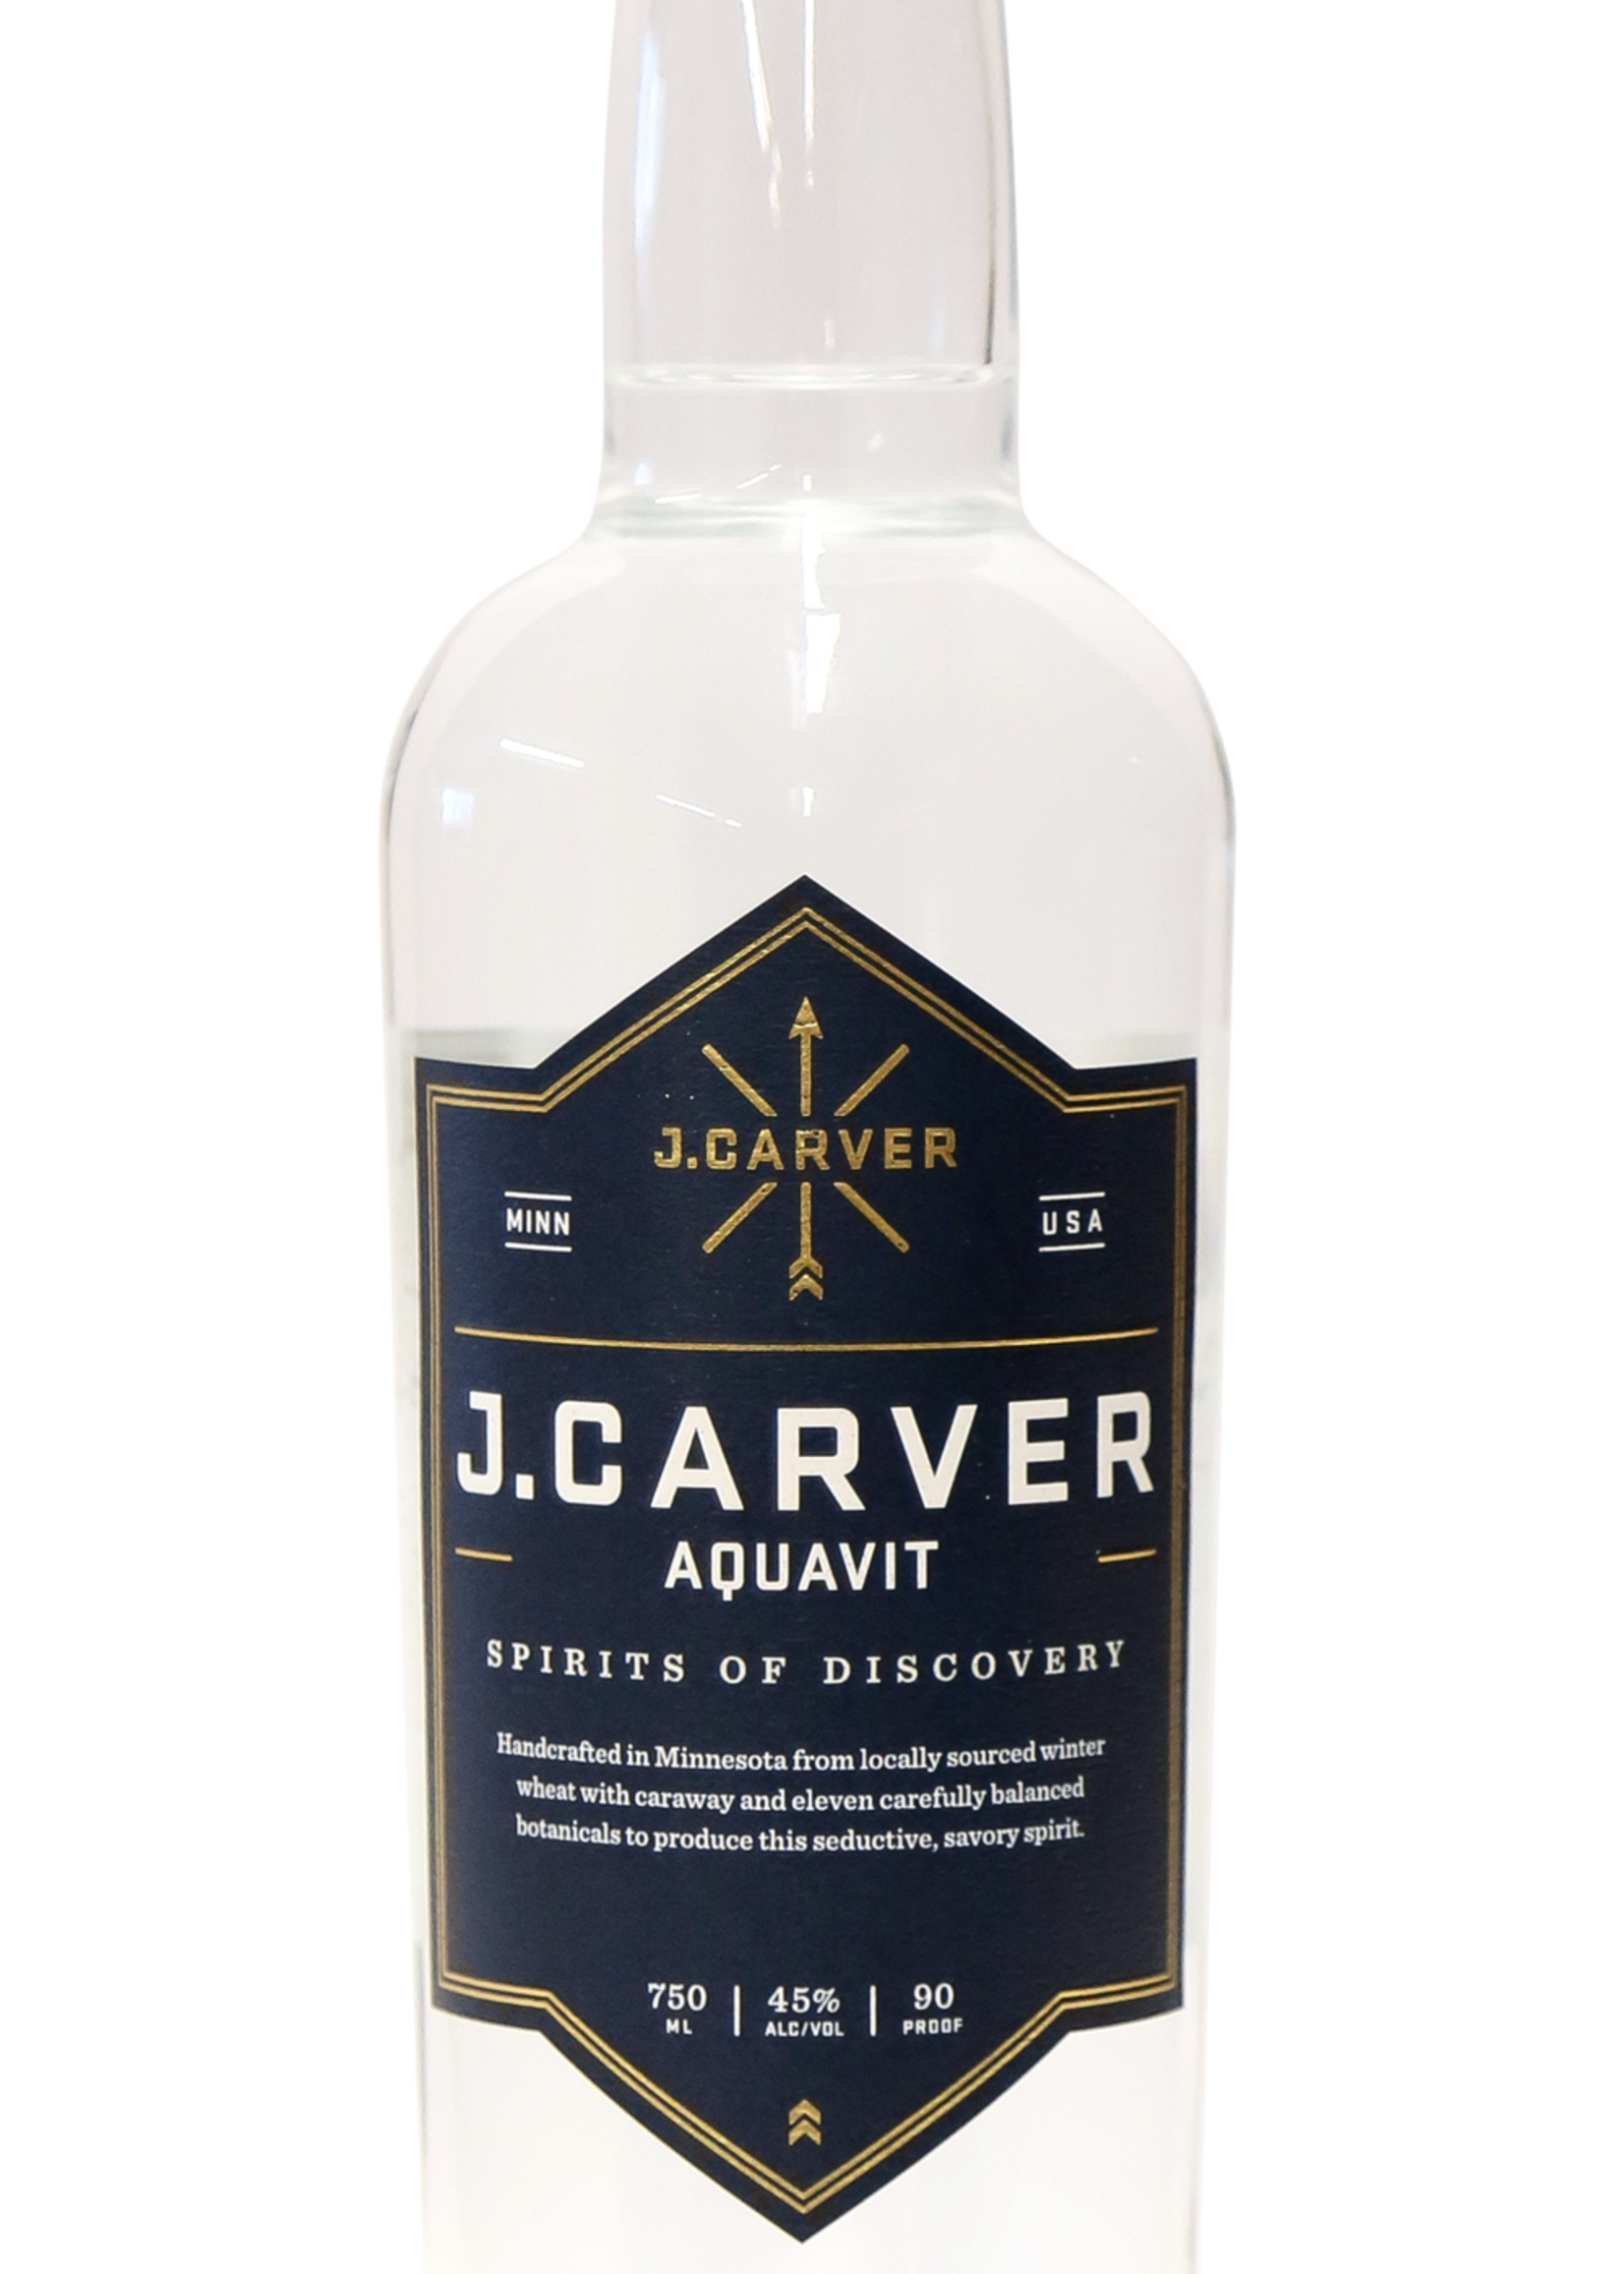 J. Carver Aquavit